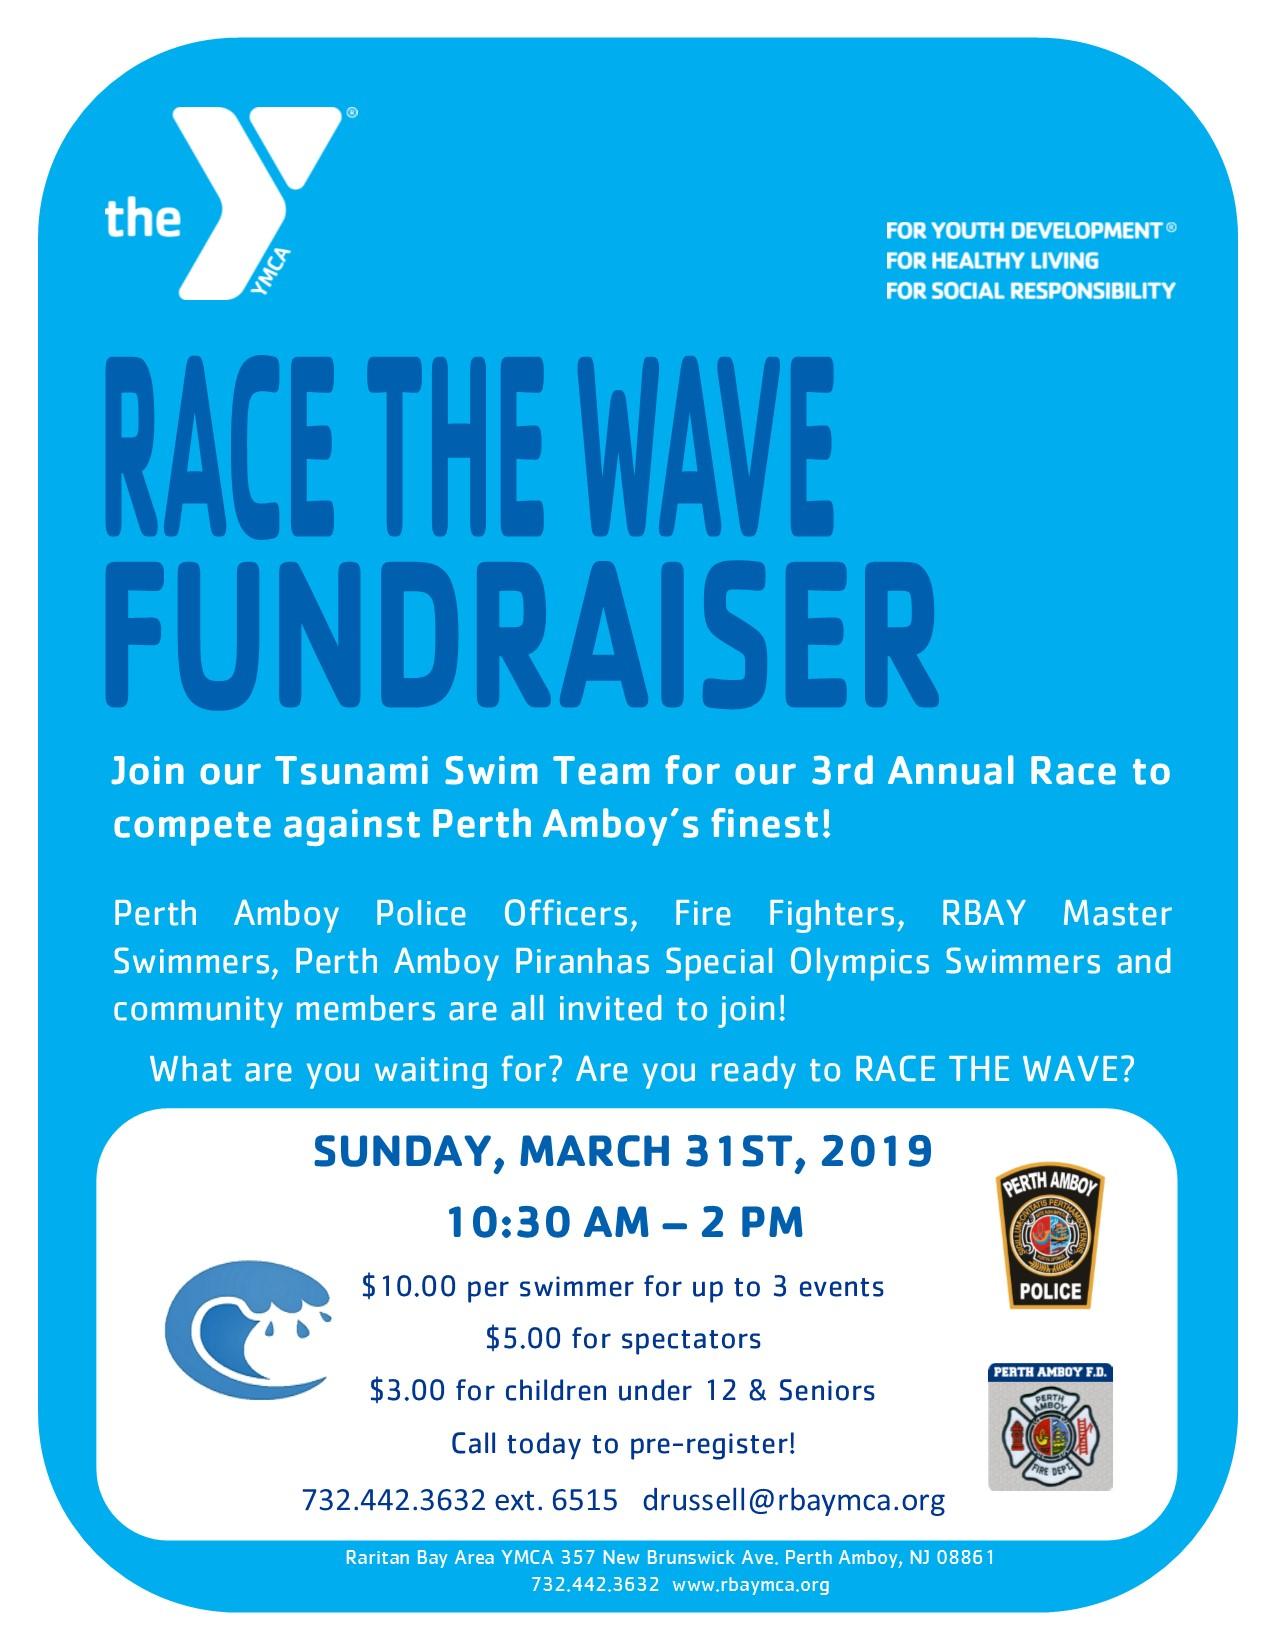 Race The Wave Fundraiser